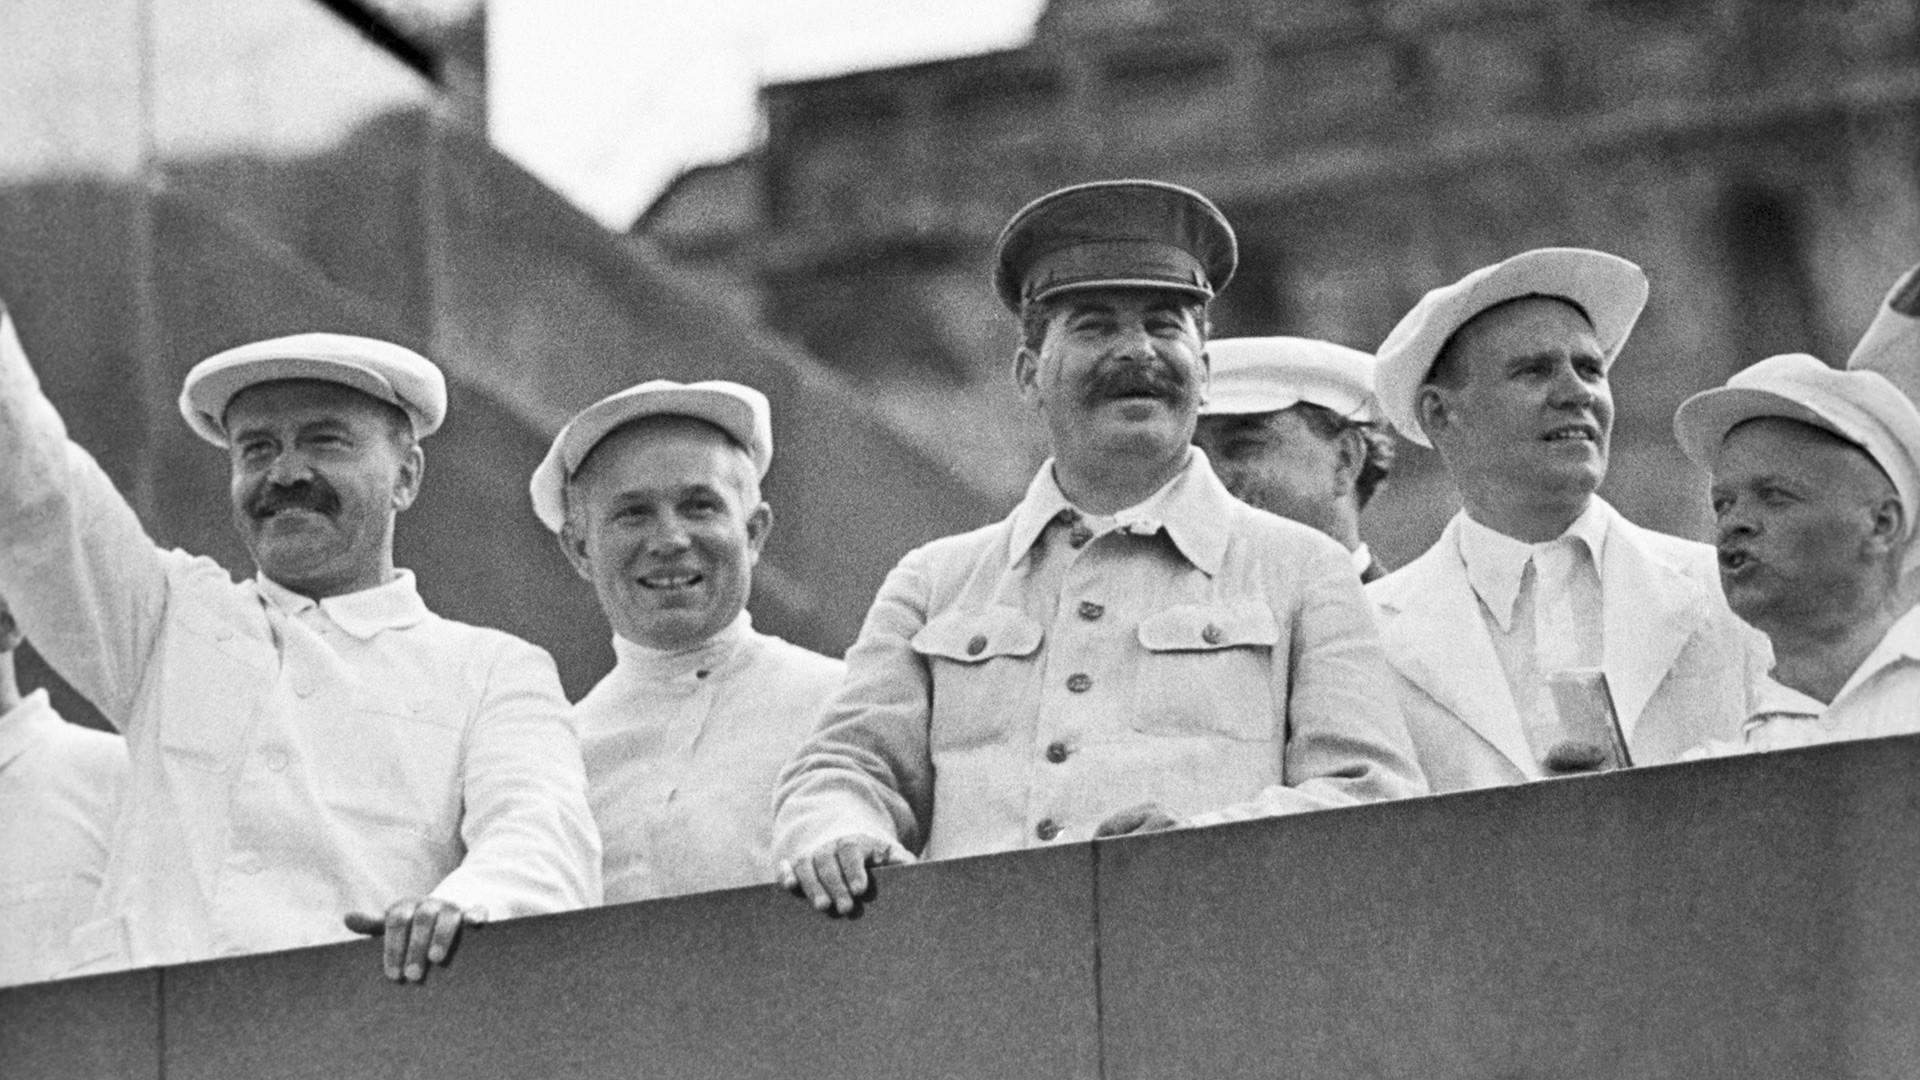 Plaza Roja, Mosсú. De la izq a la drcha: V.M. Mólotov, N.S. Jrushchov, I.V. Stalin.